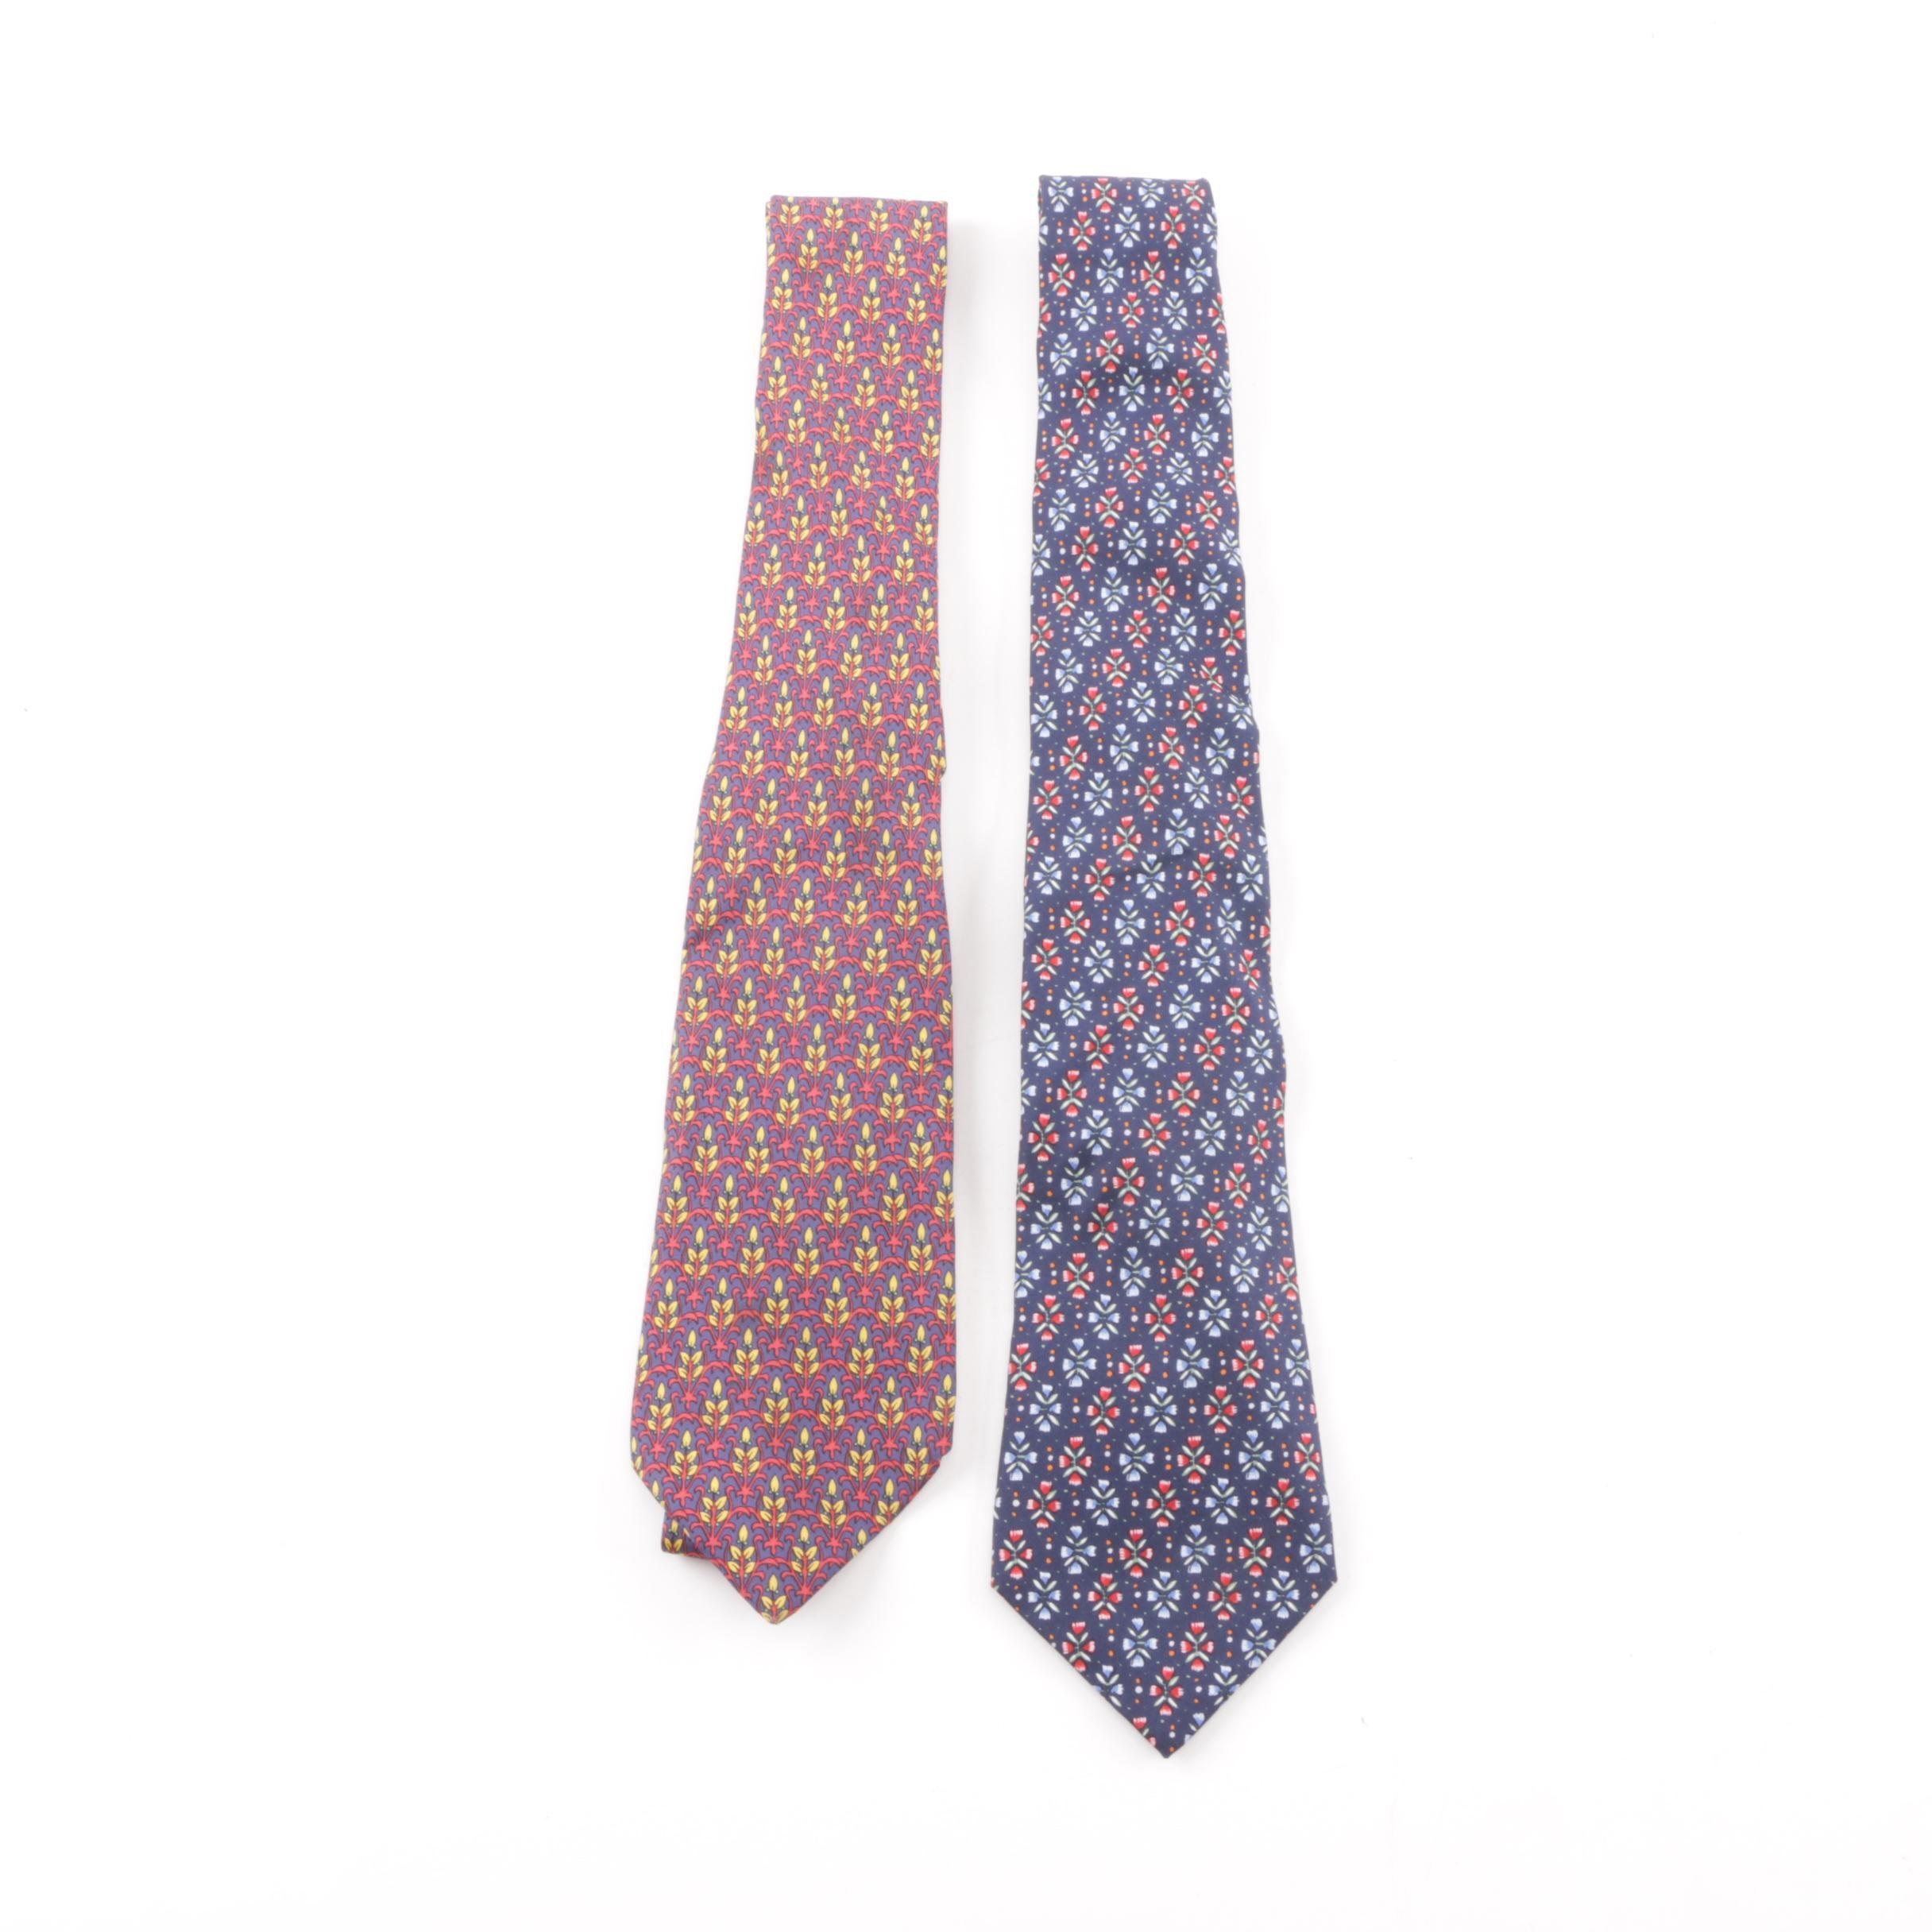 Hermès of Paris Floral Print Silk Neckties